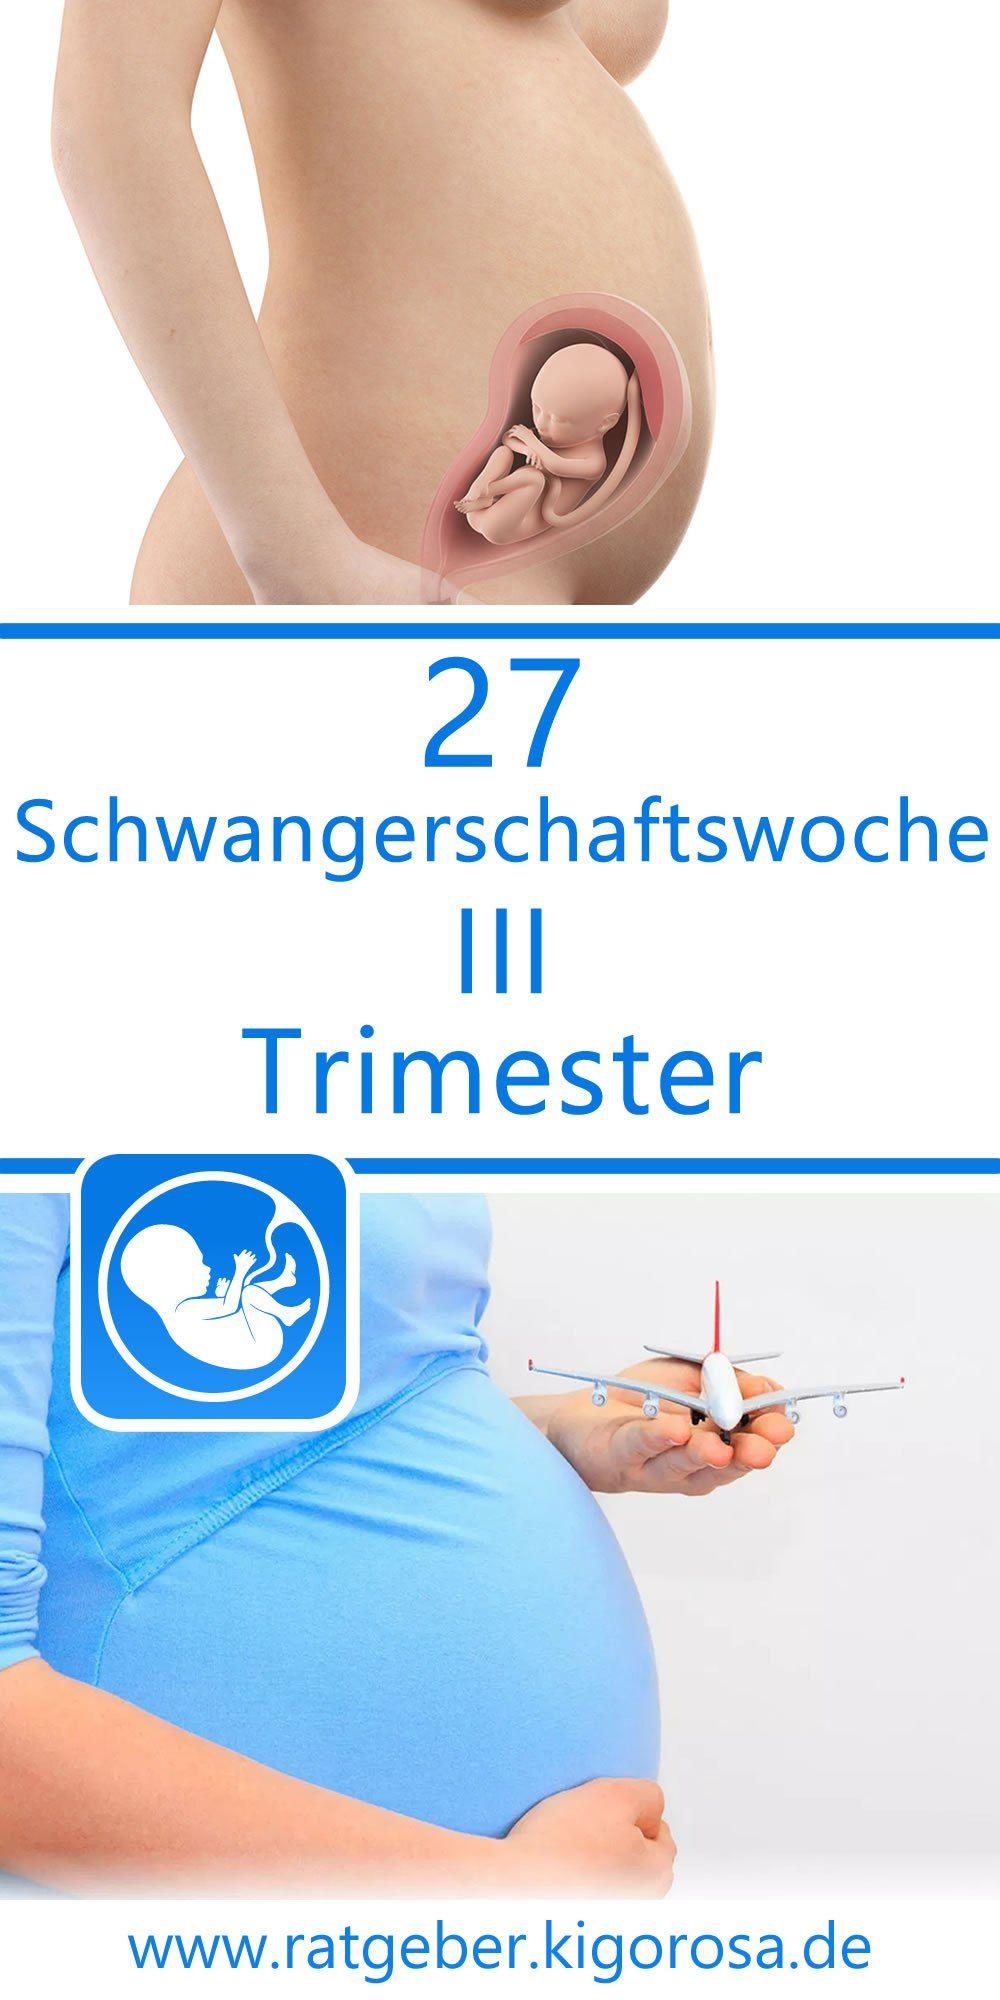 27 schwangerschaftswoche 3 trimester gruppenboard. Black Bedroom Furniture Sets. Home Design Ideas